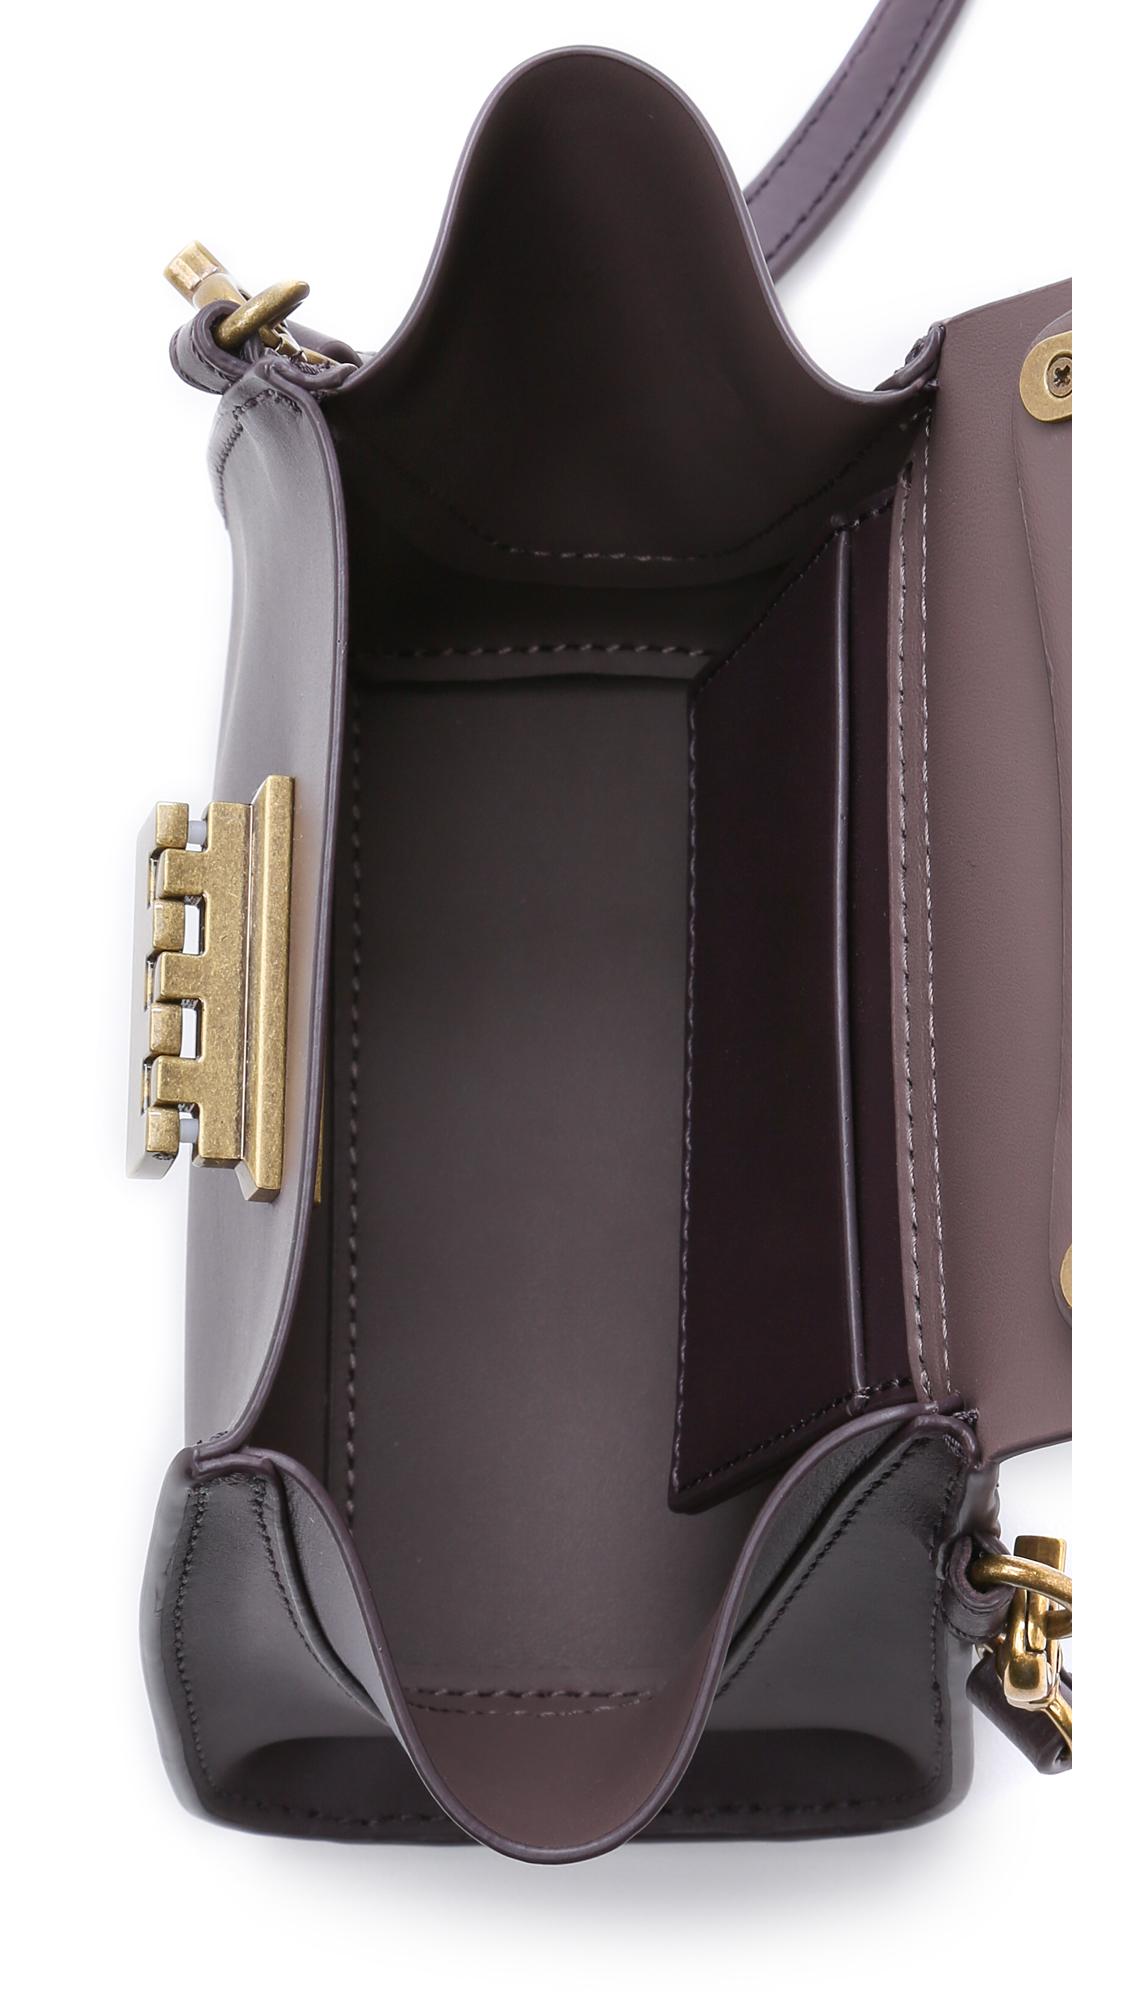 Lyst Zac Zac Posen Eartha Top Handle Mini Cross Body Bag